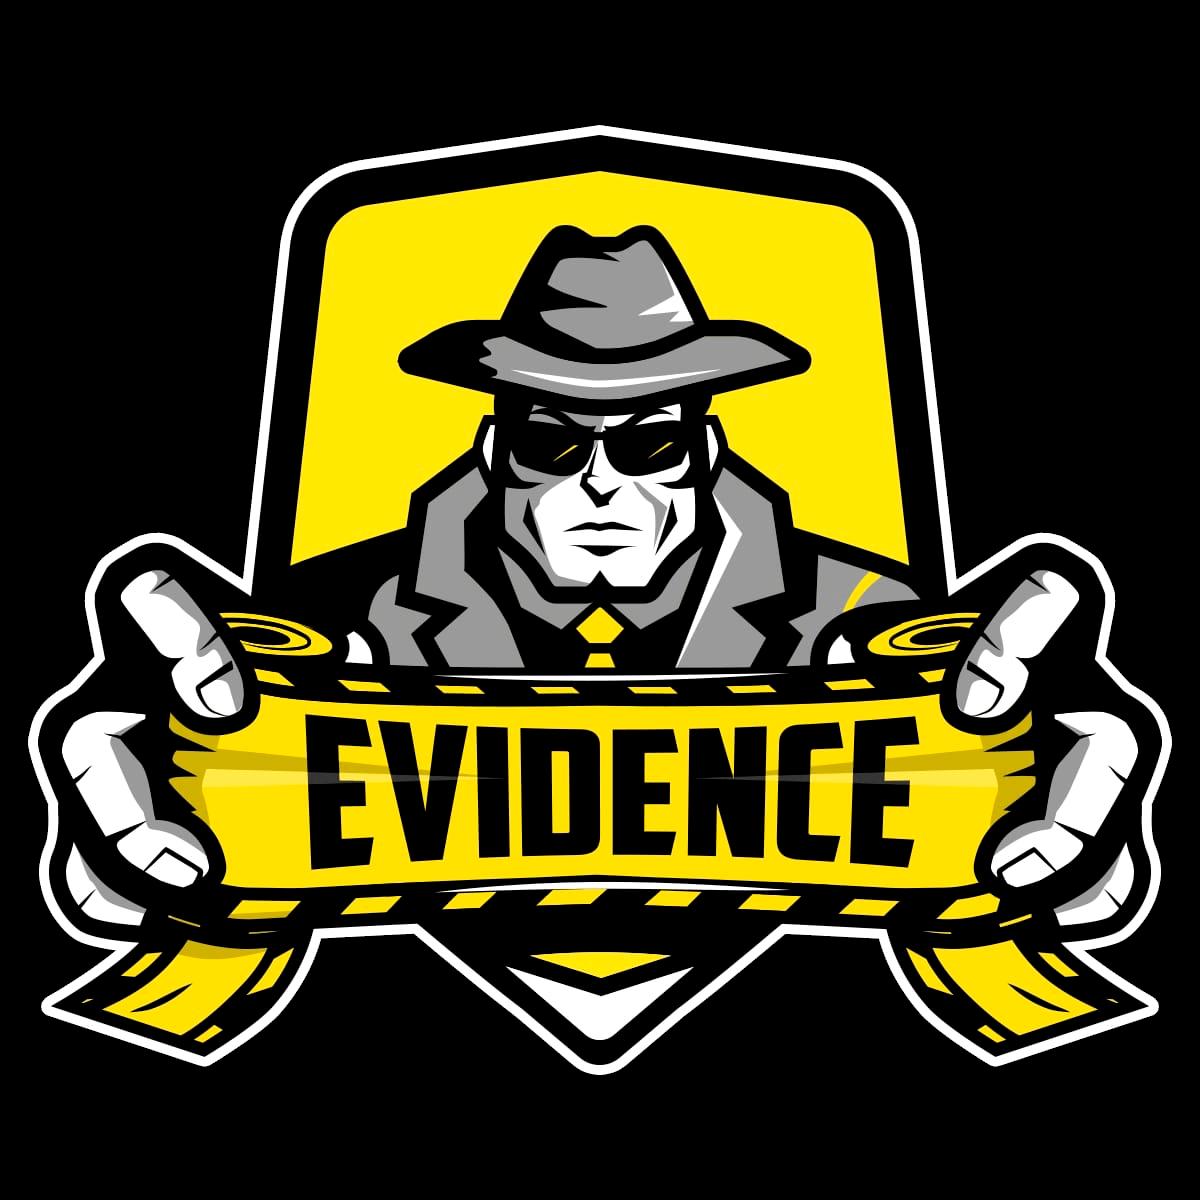 Evidence e-Sports